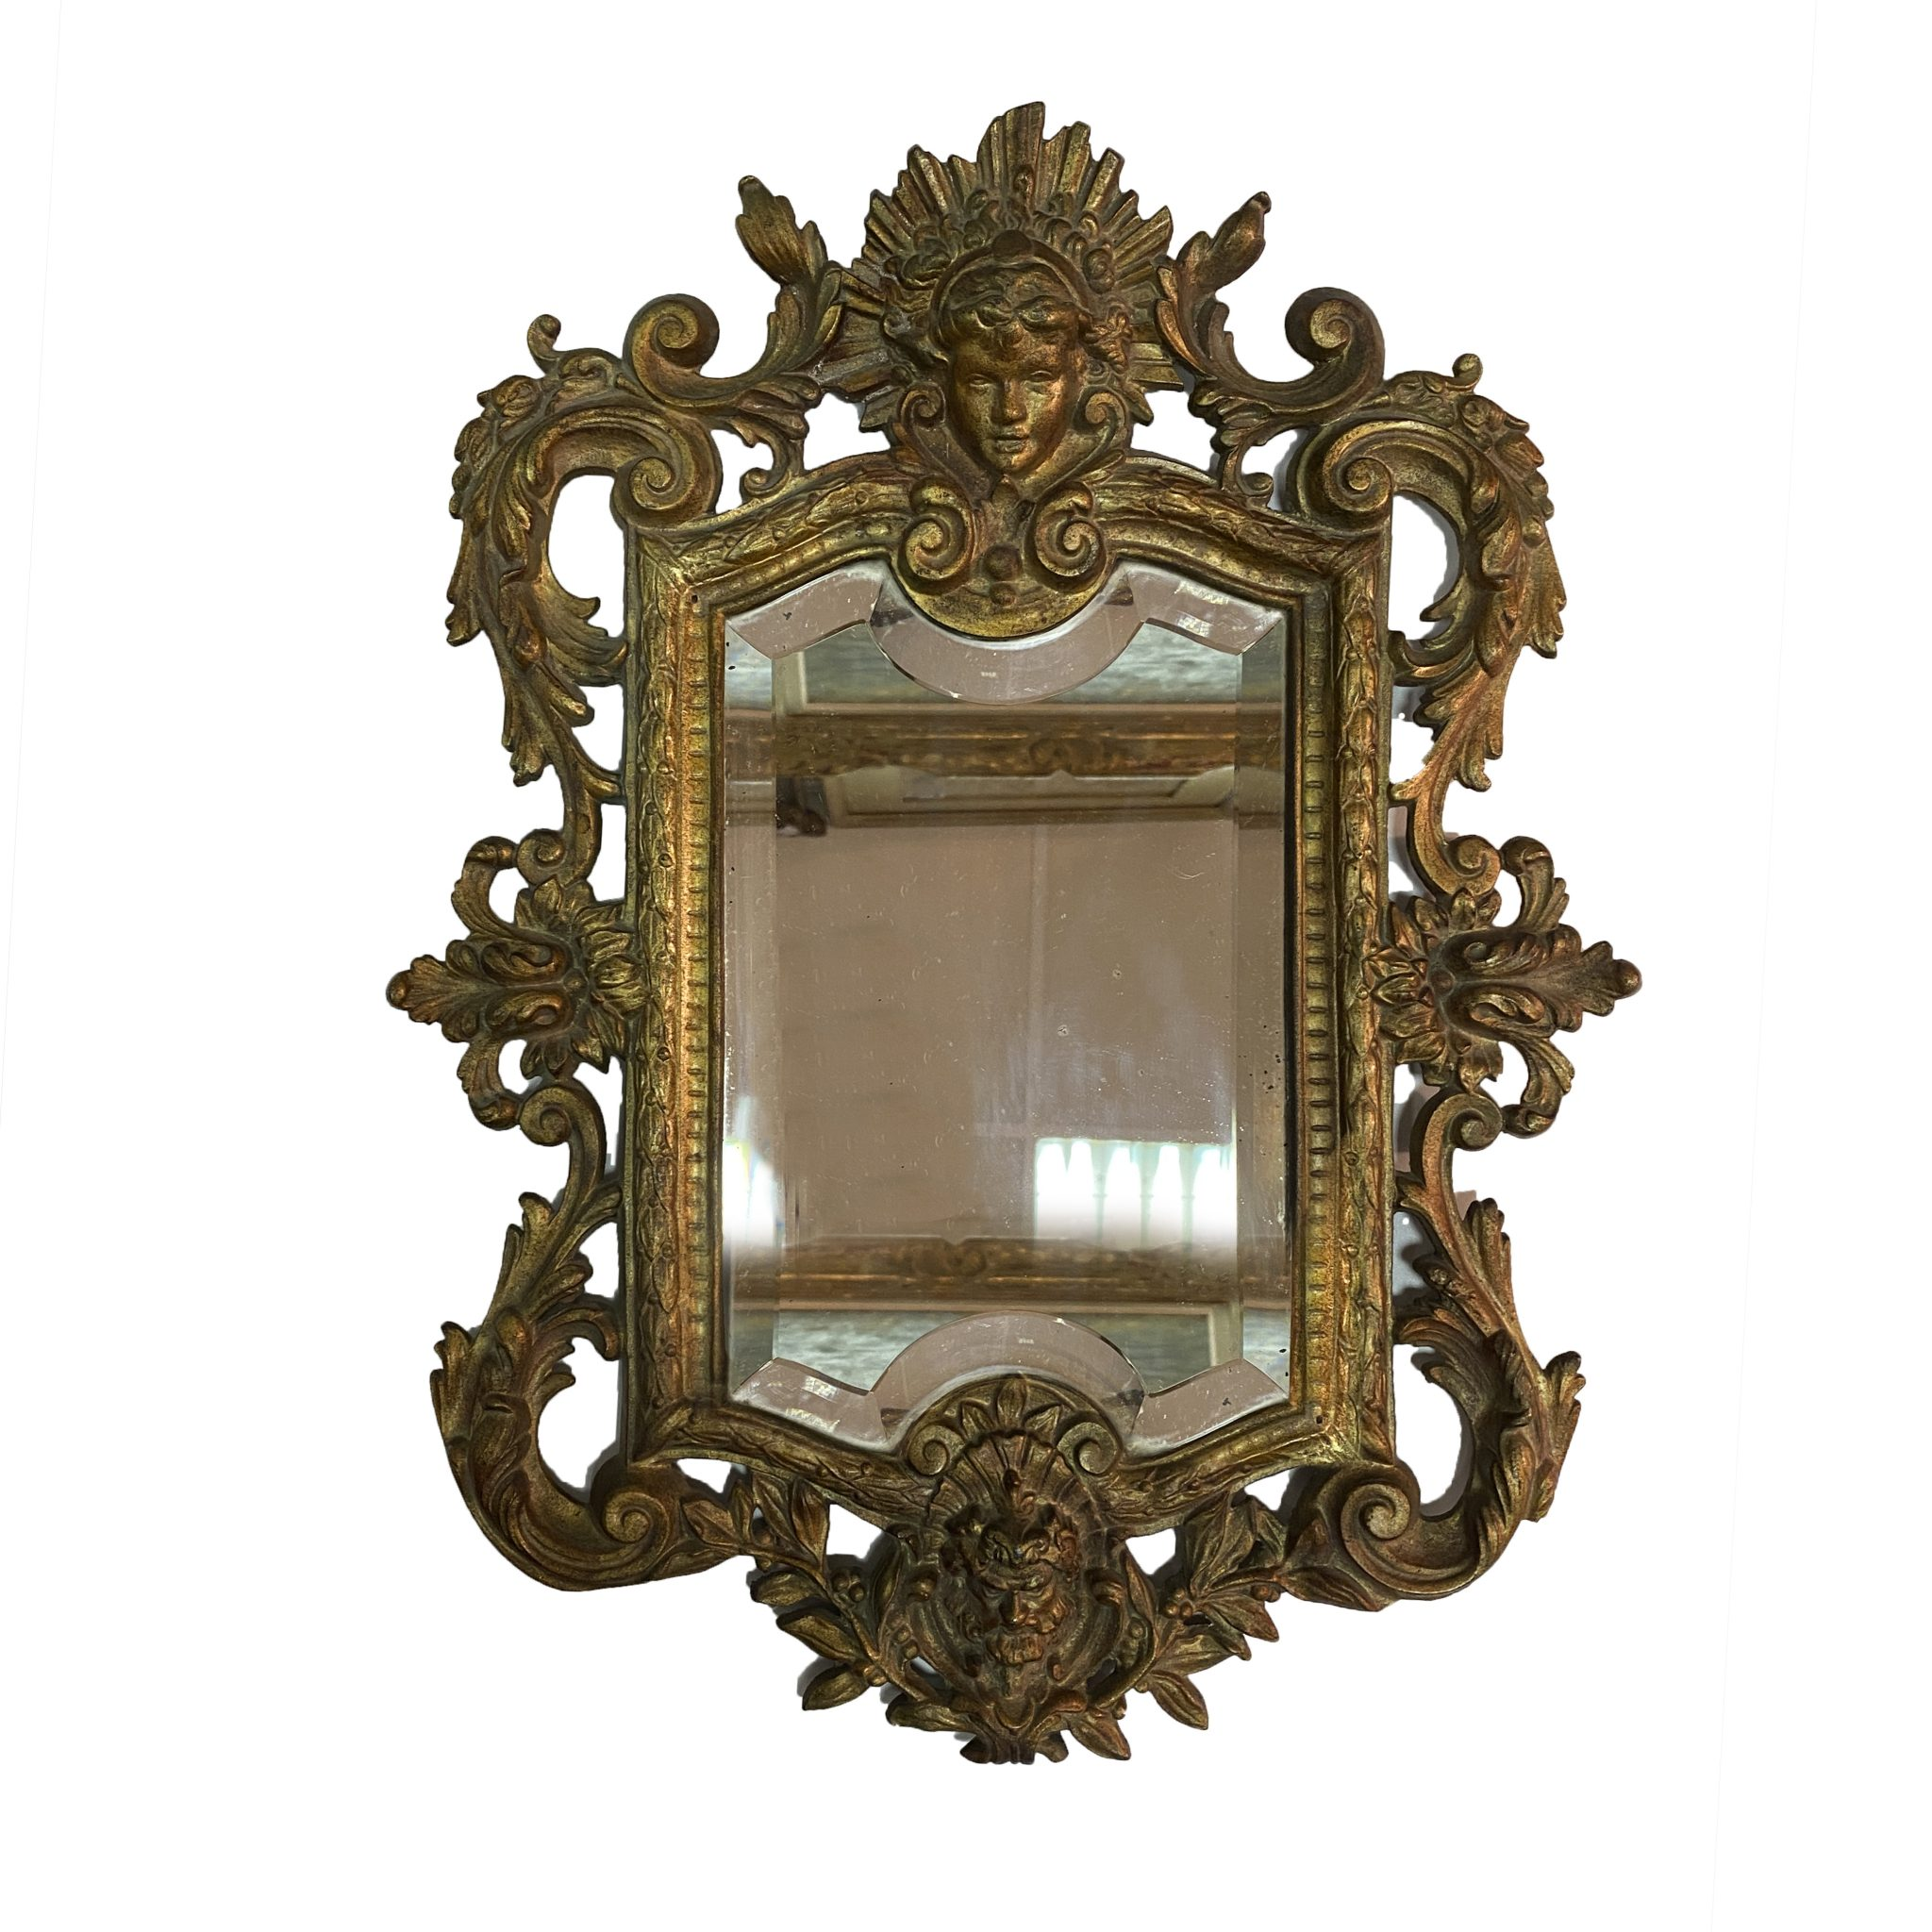 Miroir en bronze doré Régence